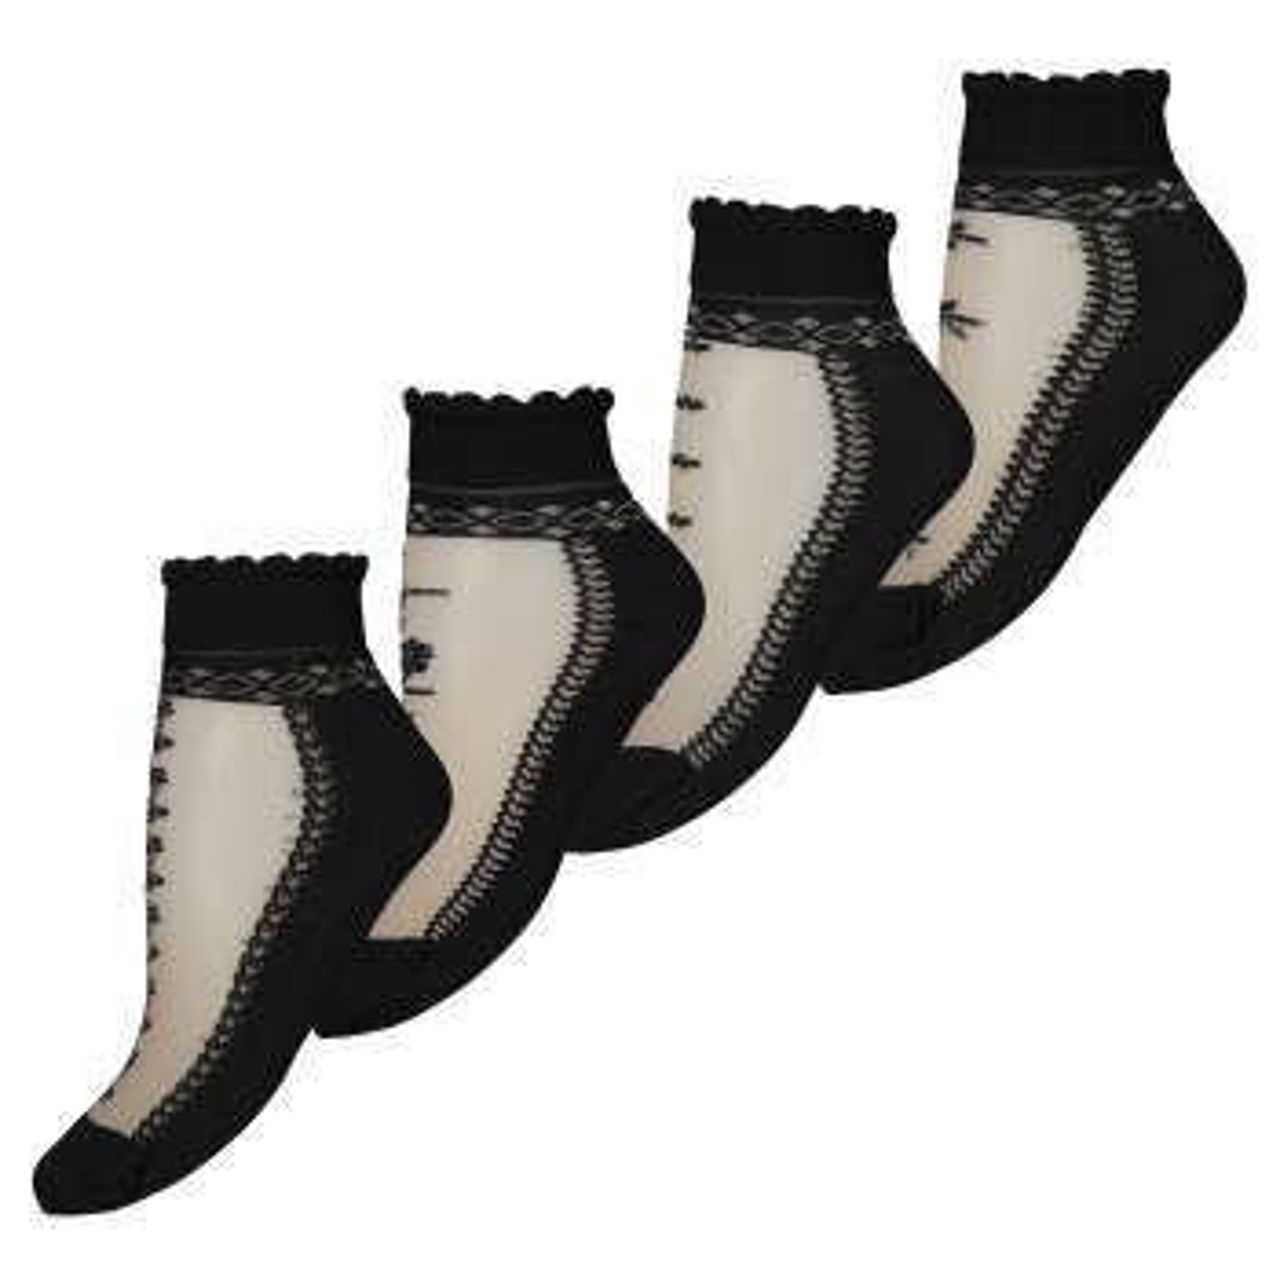 جوراب زنانه بسته 4 عددی